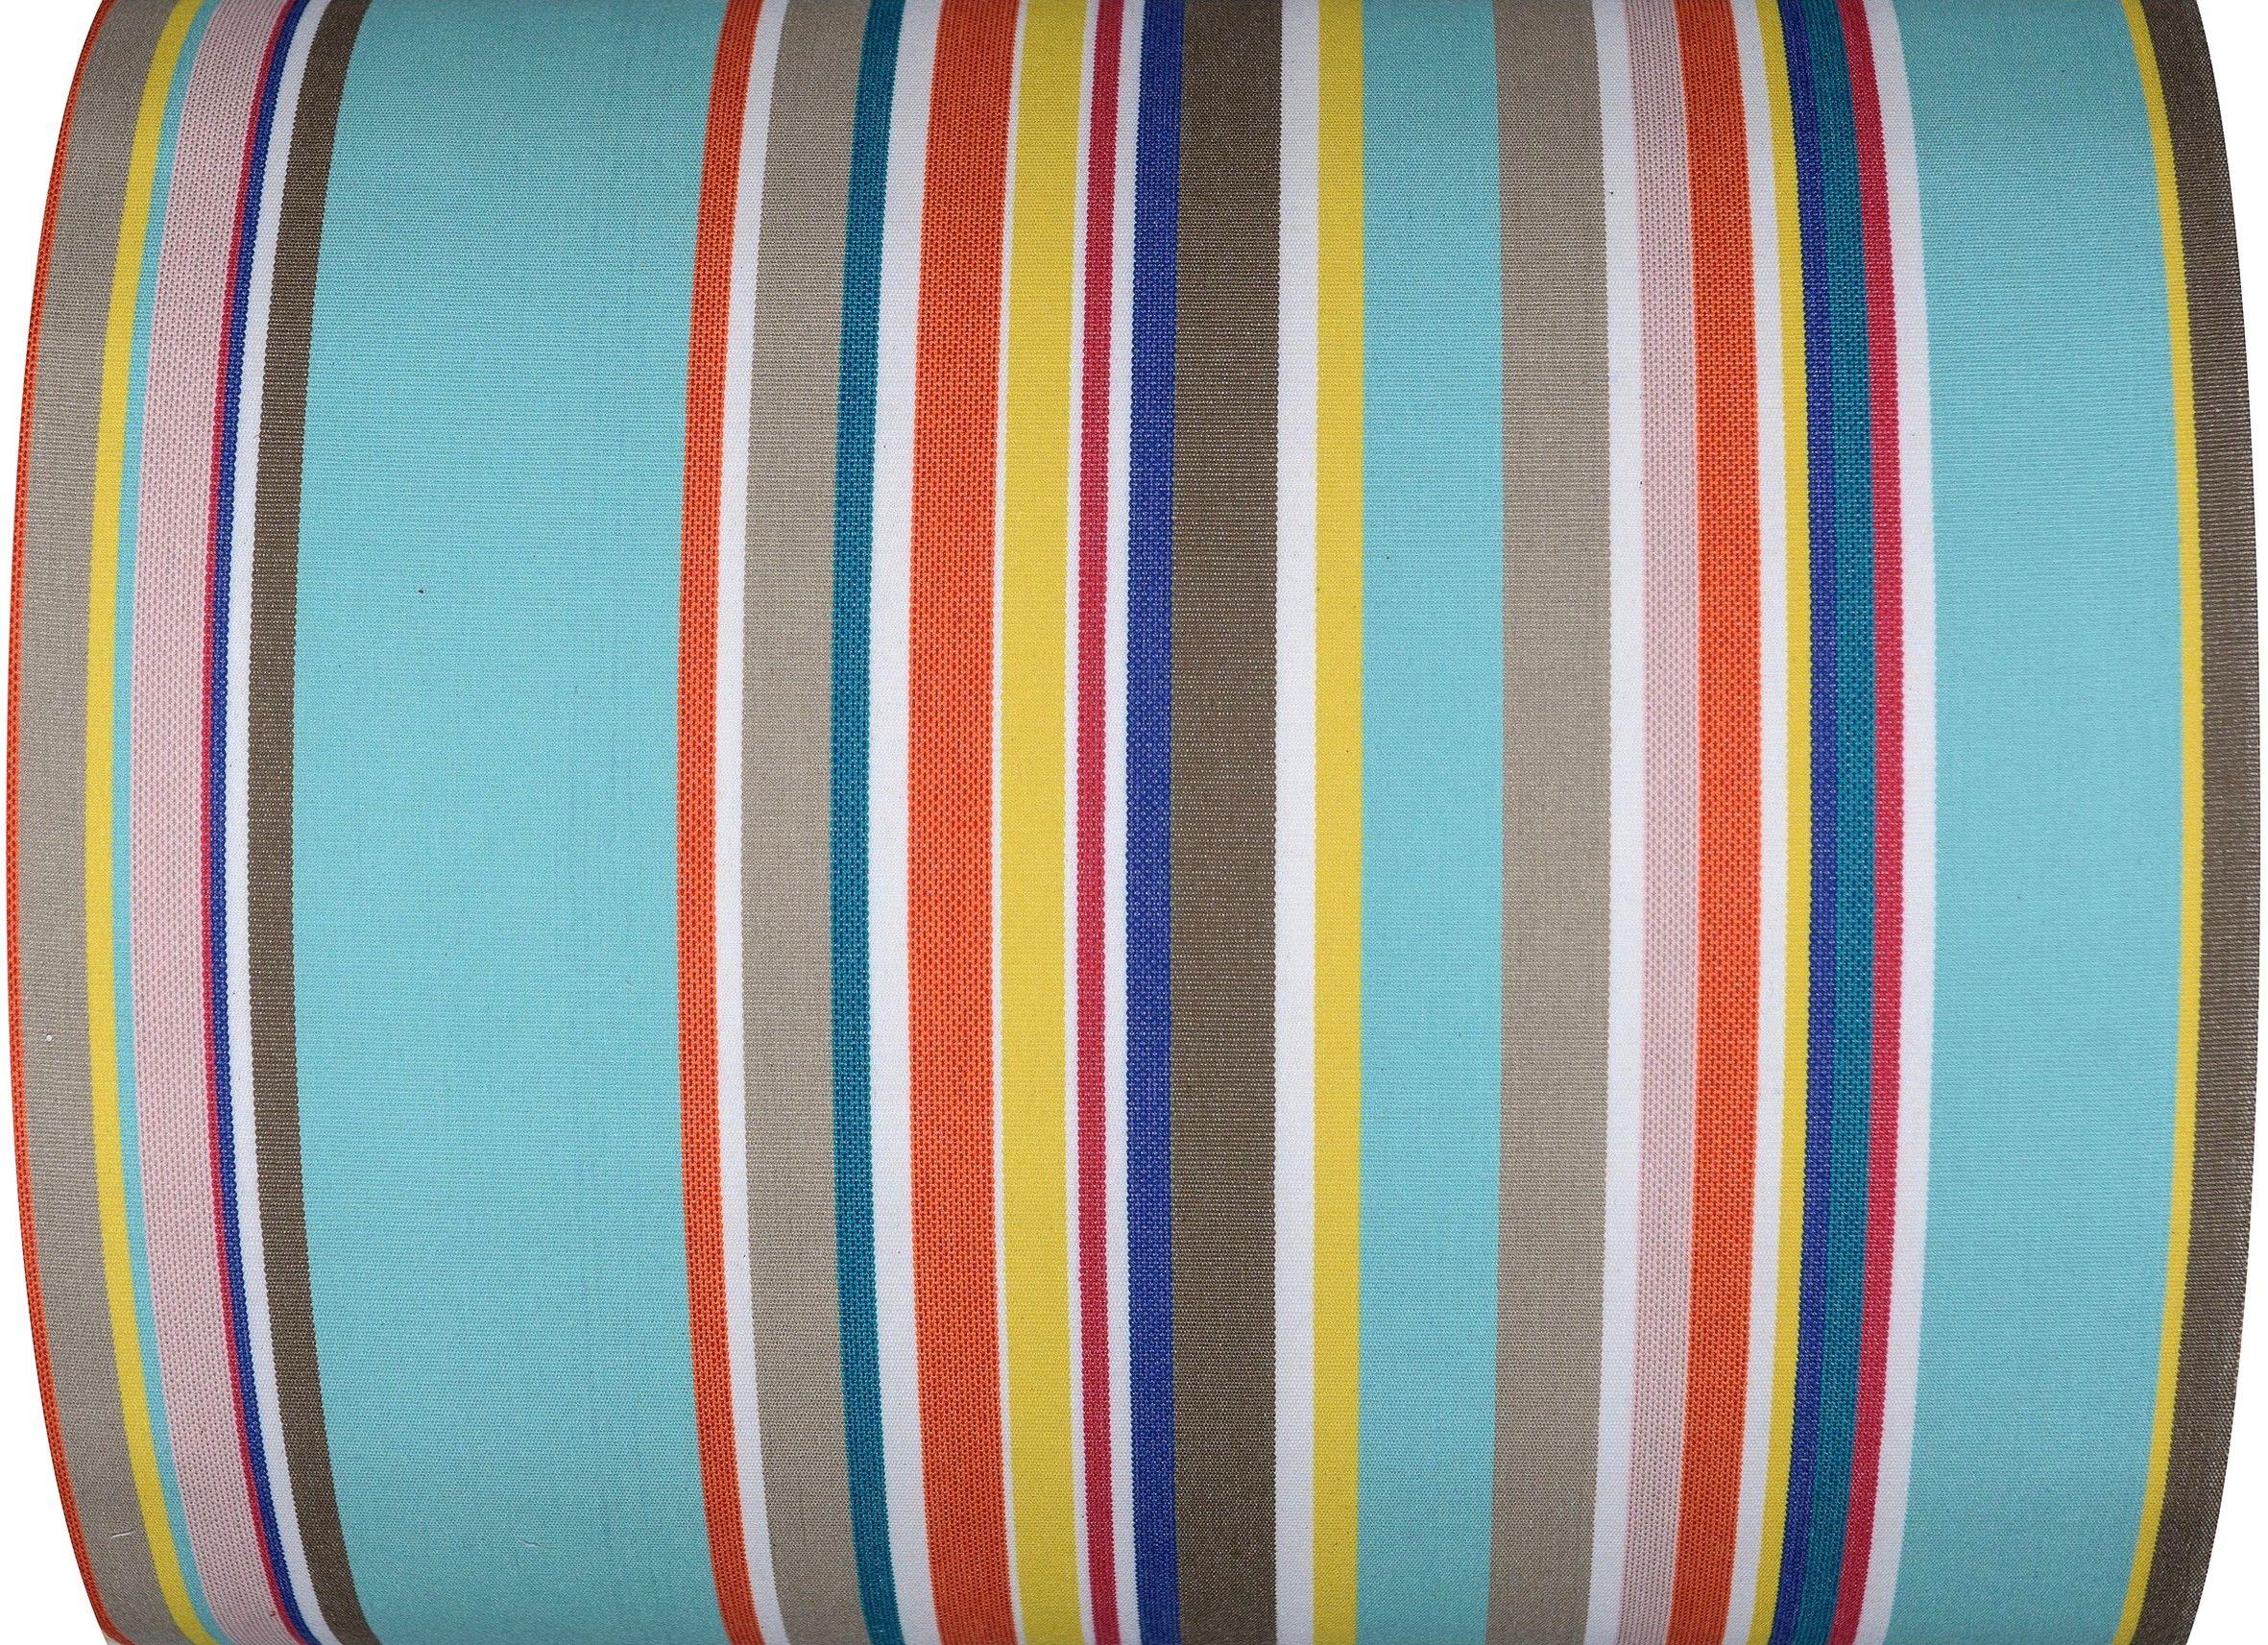 b39e88b90ddcf9b0af99e3c55f8c576c Frais De toile Parasol Concept